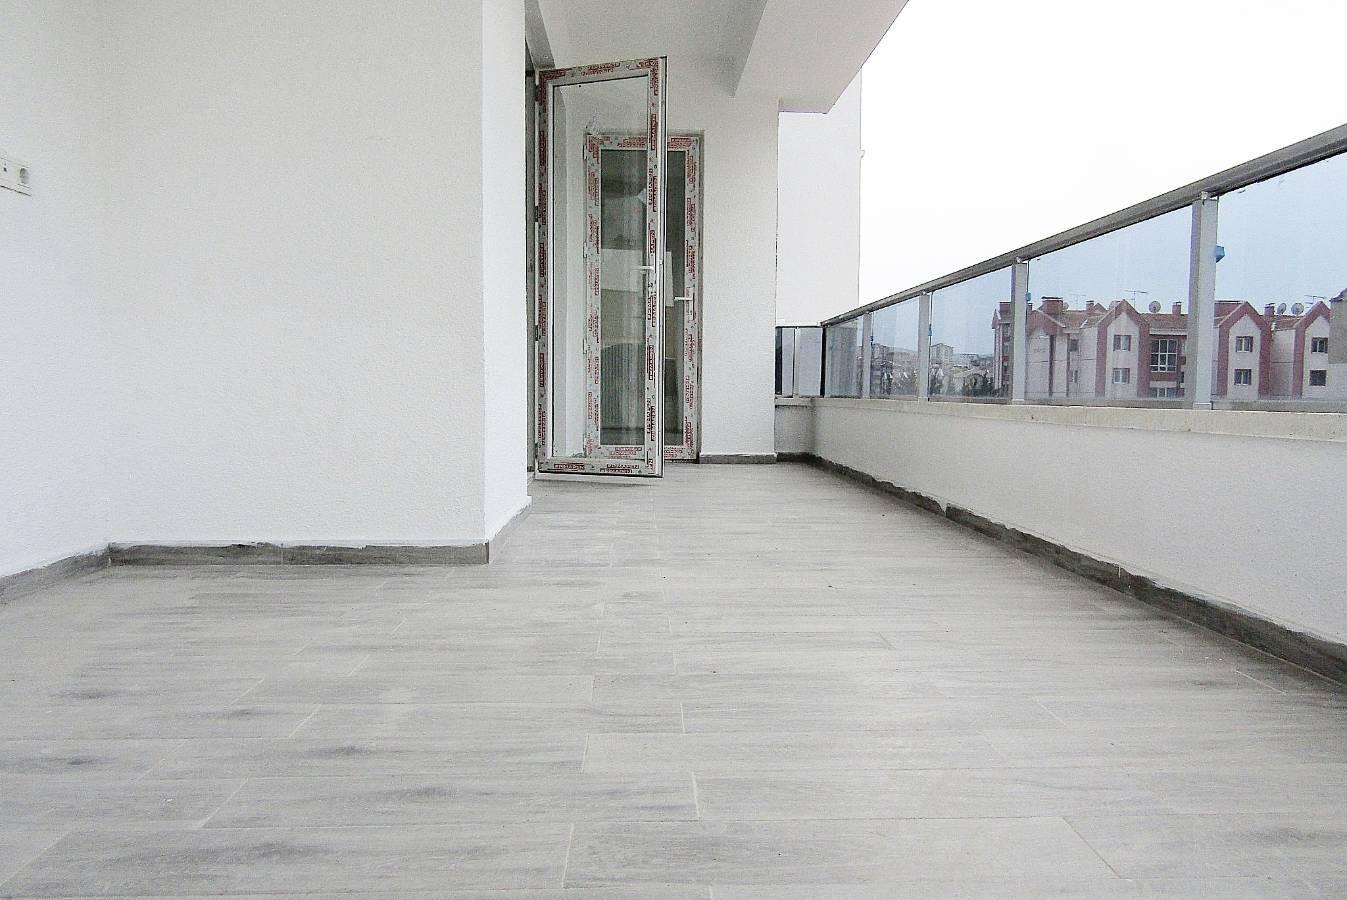 SR EMLAK'TAN TOPÇU MAH'DE 3+1 155m² ASANSÖRLÜ SIFIR LÜKS DAİRE